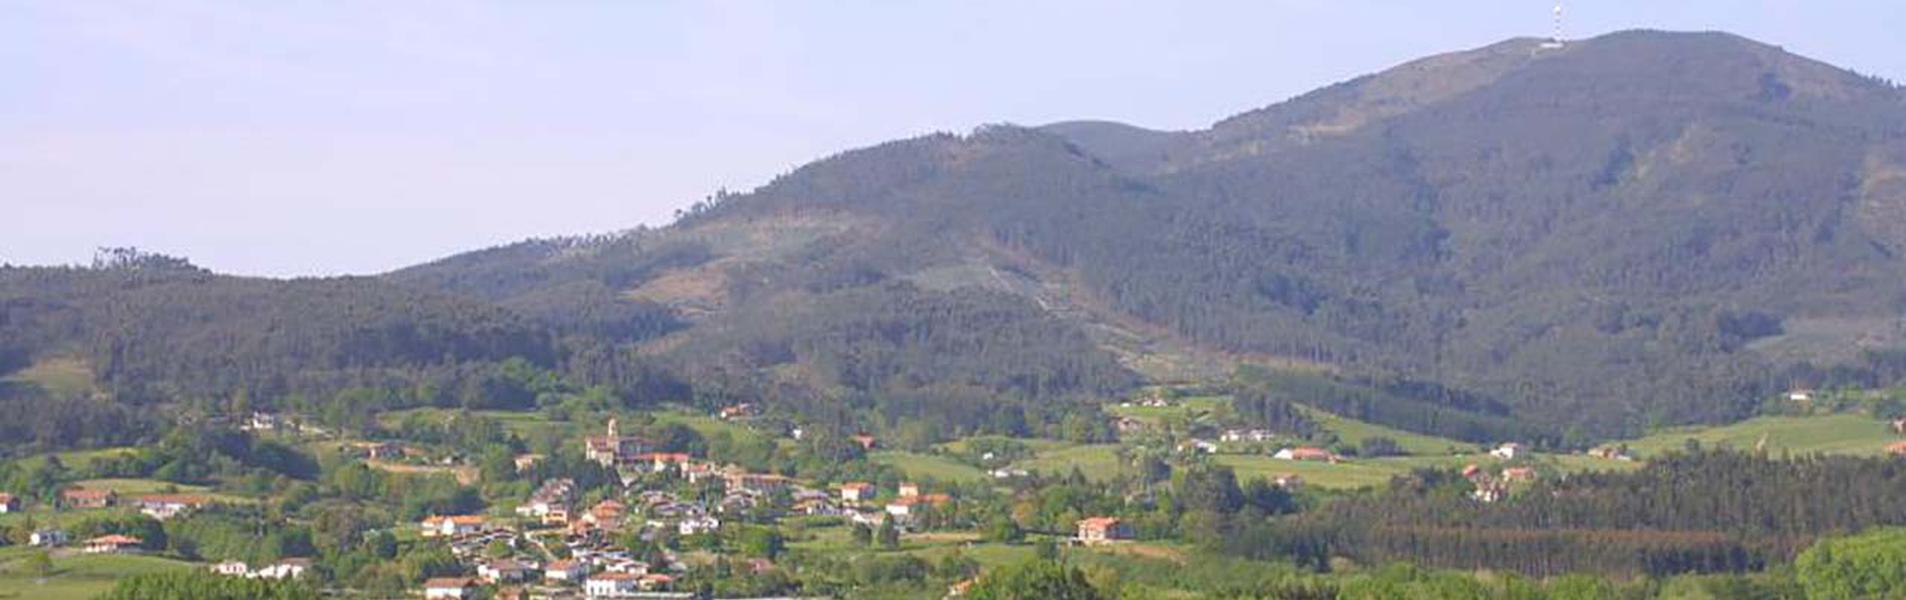 Monte Jata